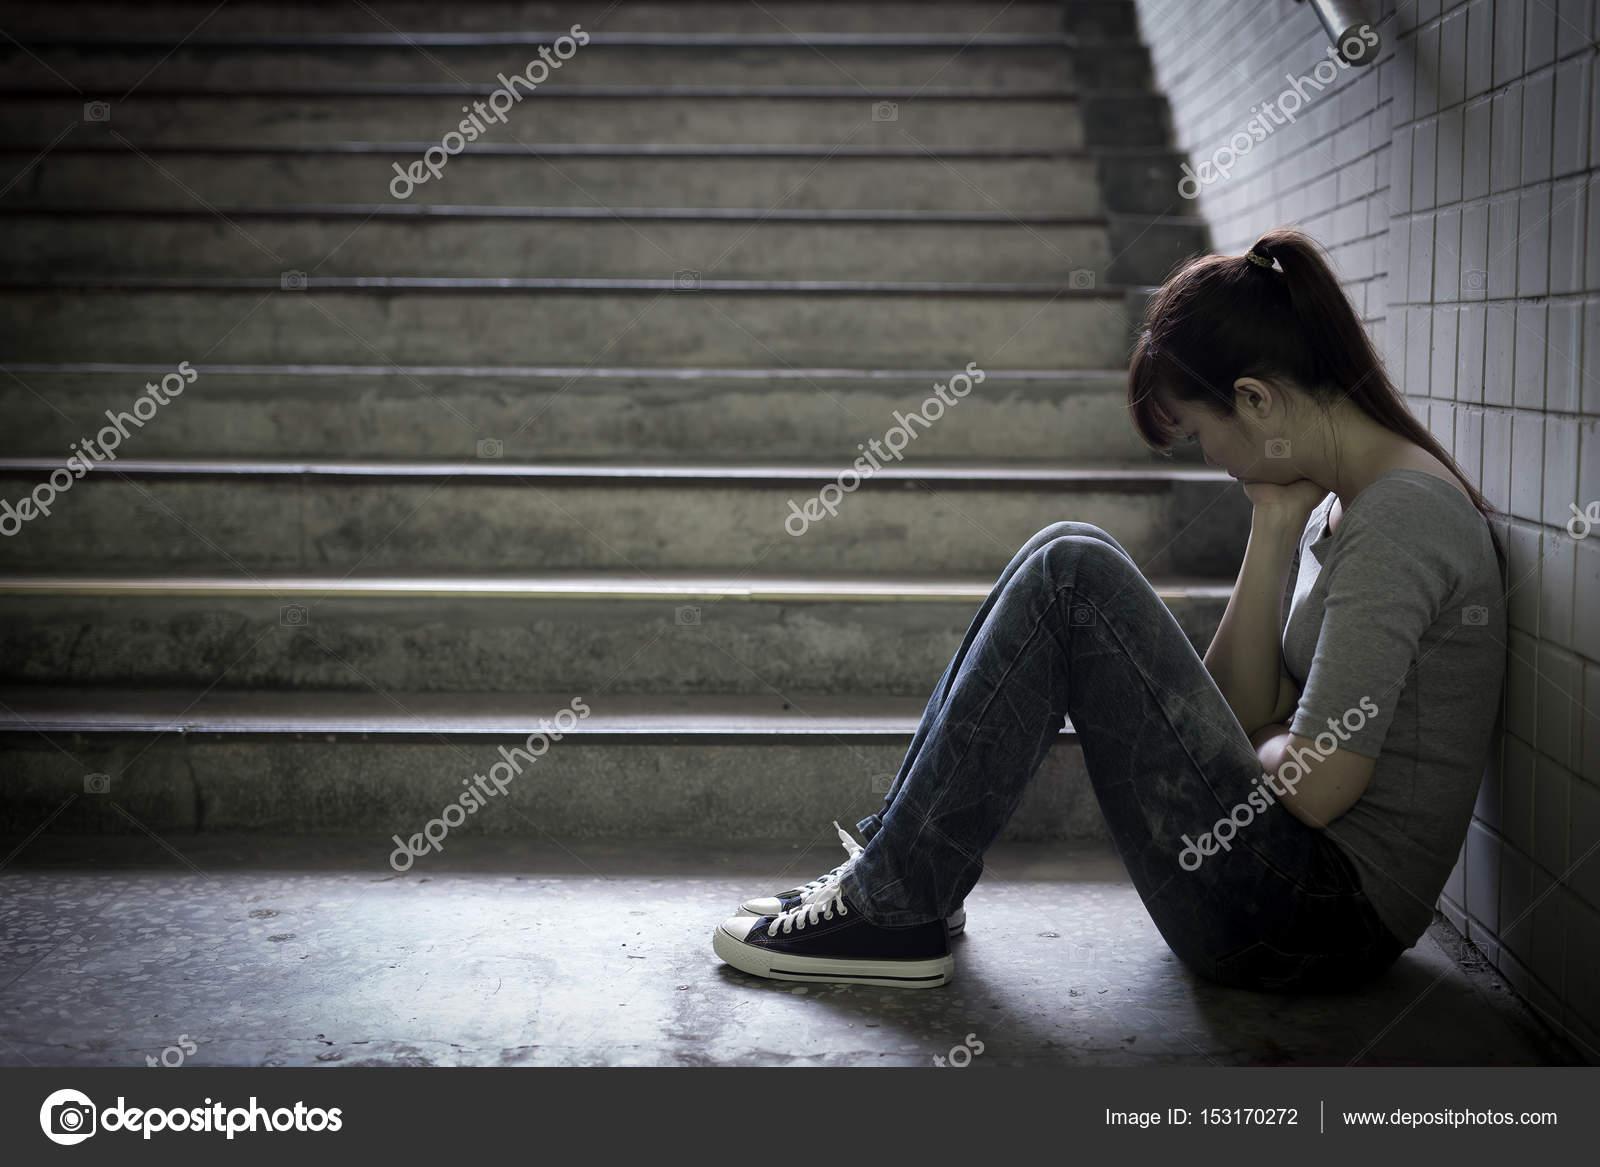 feeling upset images - HD1600×1167